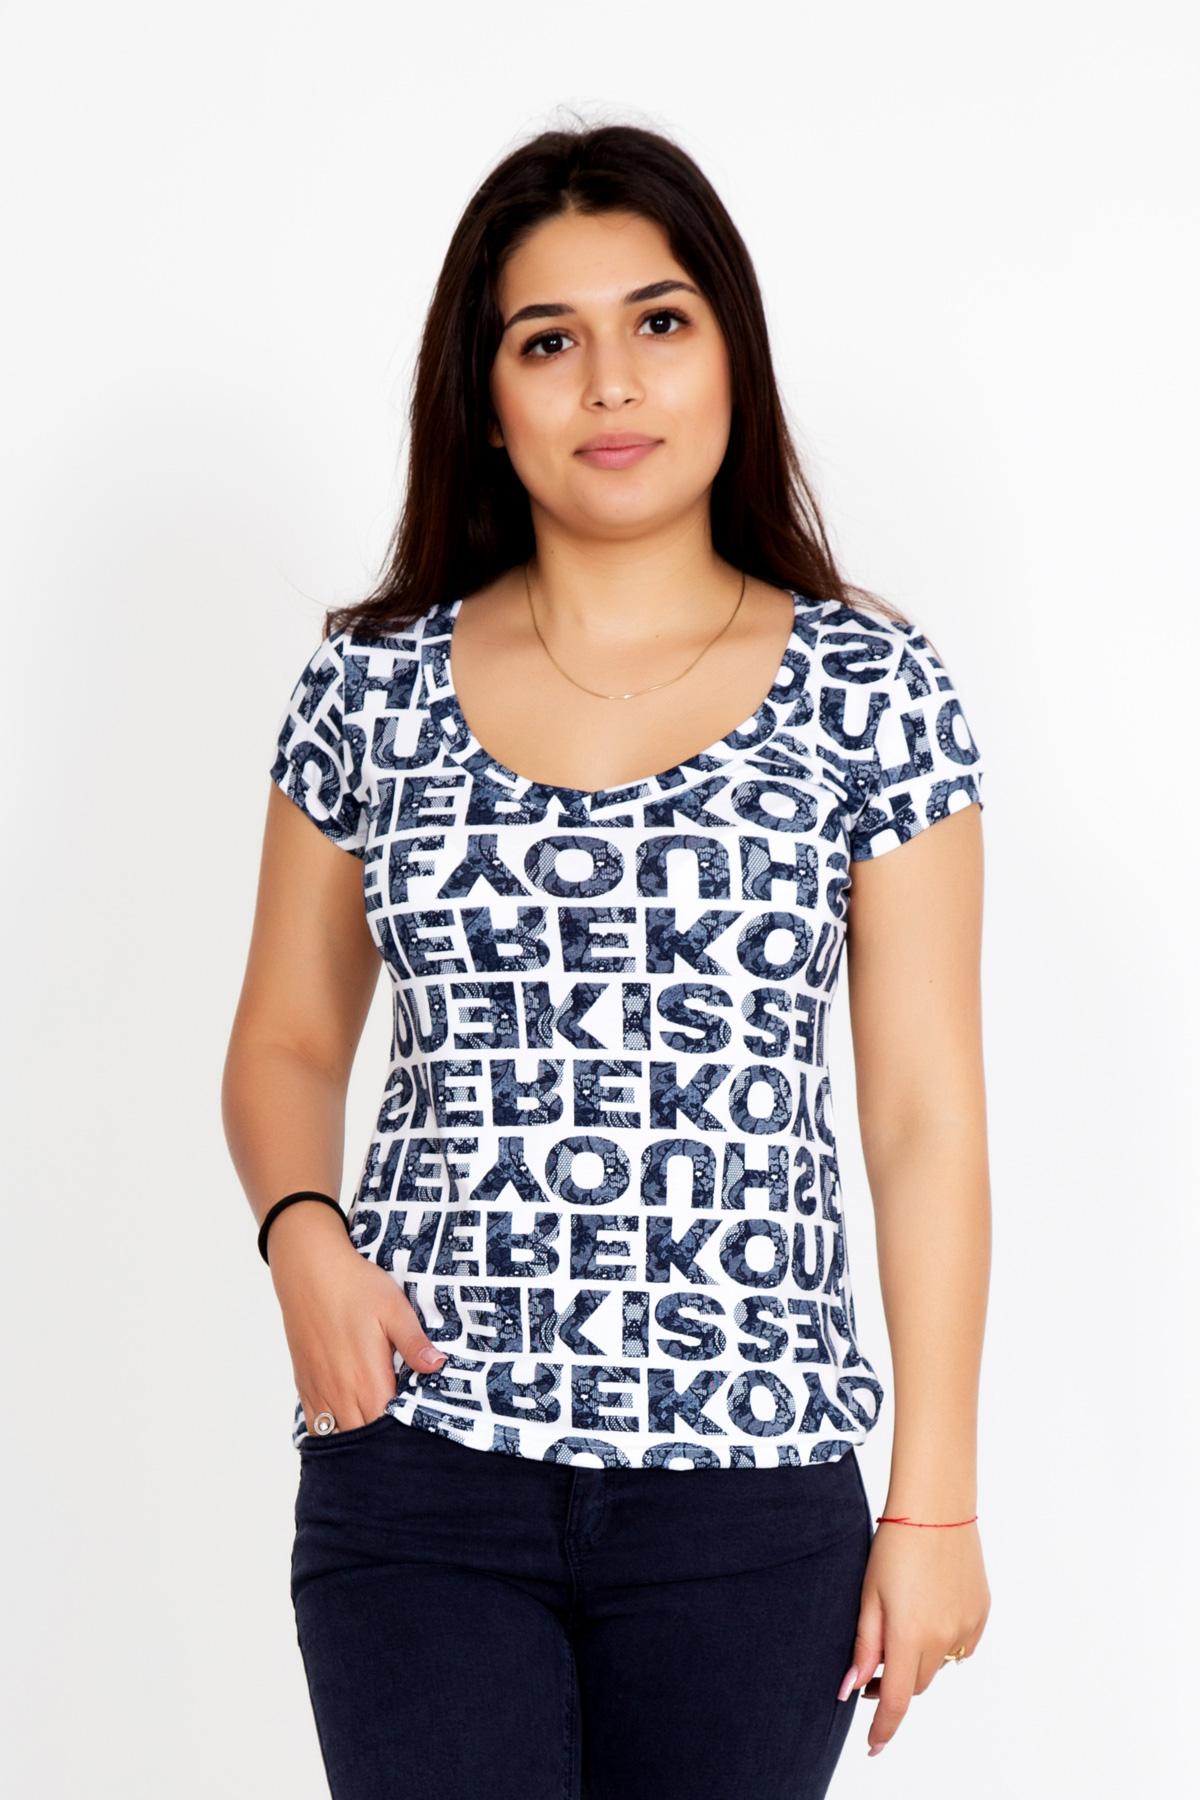 Жен. футболка Лиза р. 50Майки и футболки<br>Факт. ОГ: 88 см <br>Факт. ОТ: 84 см <br>Факт. ОБ: 94 см <br>Длина по спинке: 62 см<br><br>Тип: Жен. футболка<br>Размер: 50<br>Материал: Фулайкра